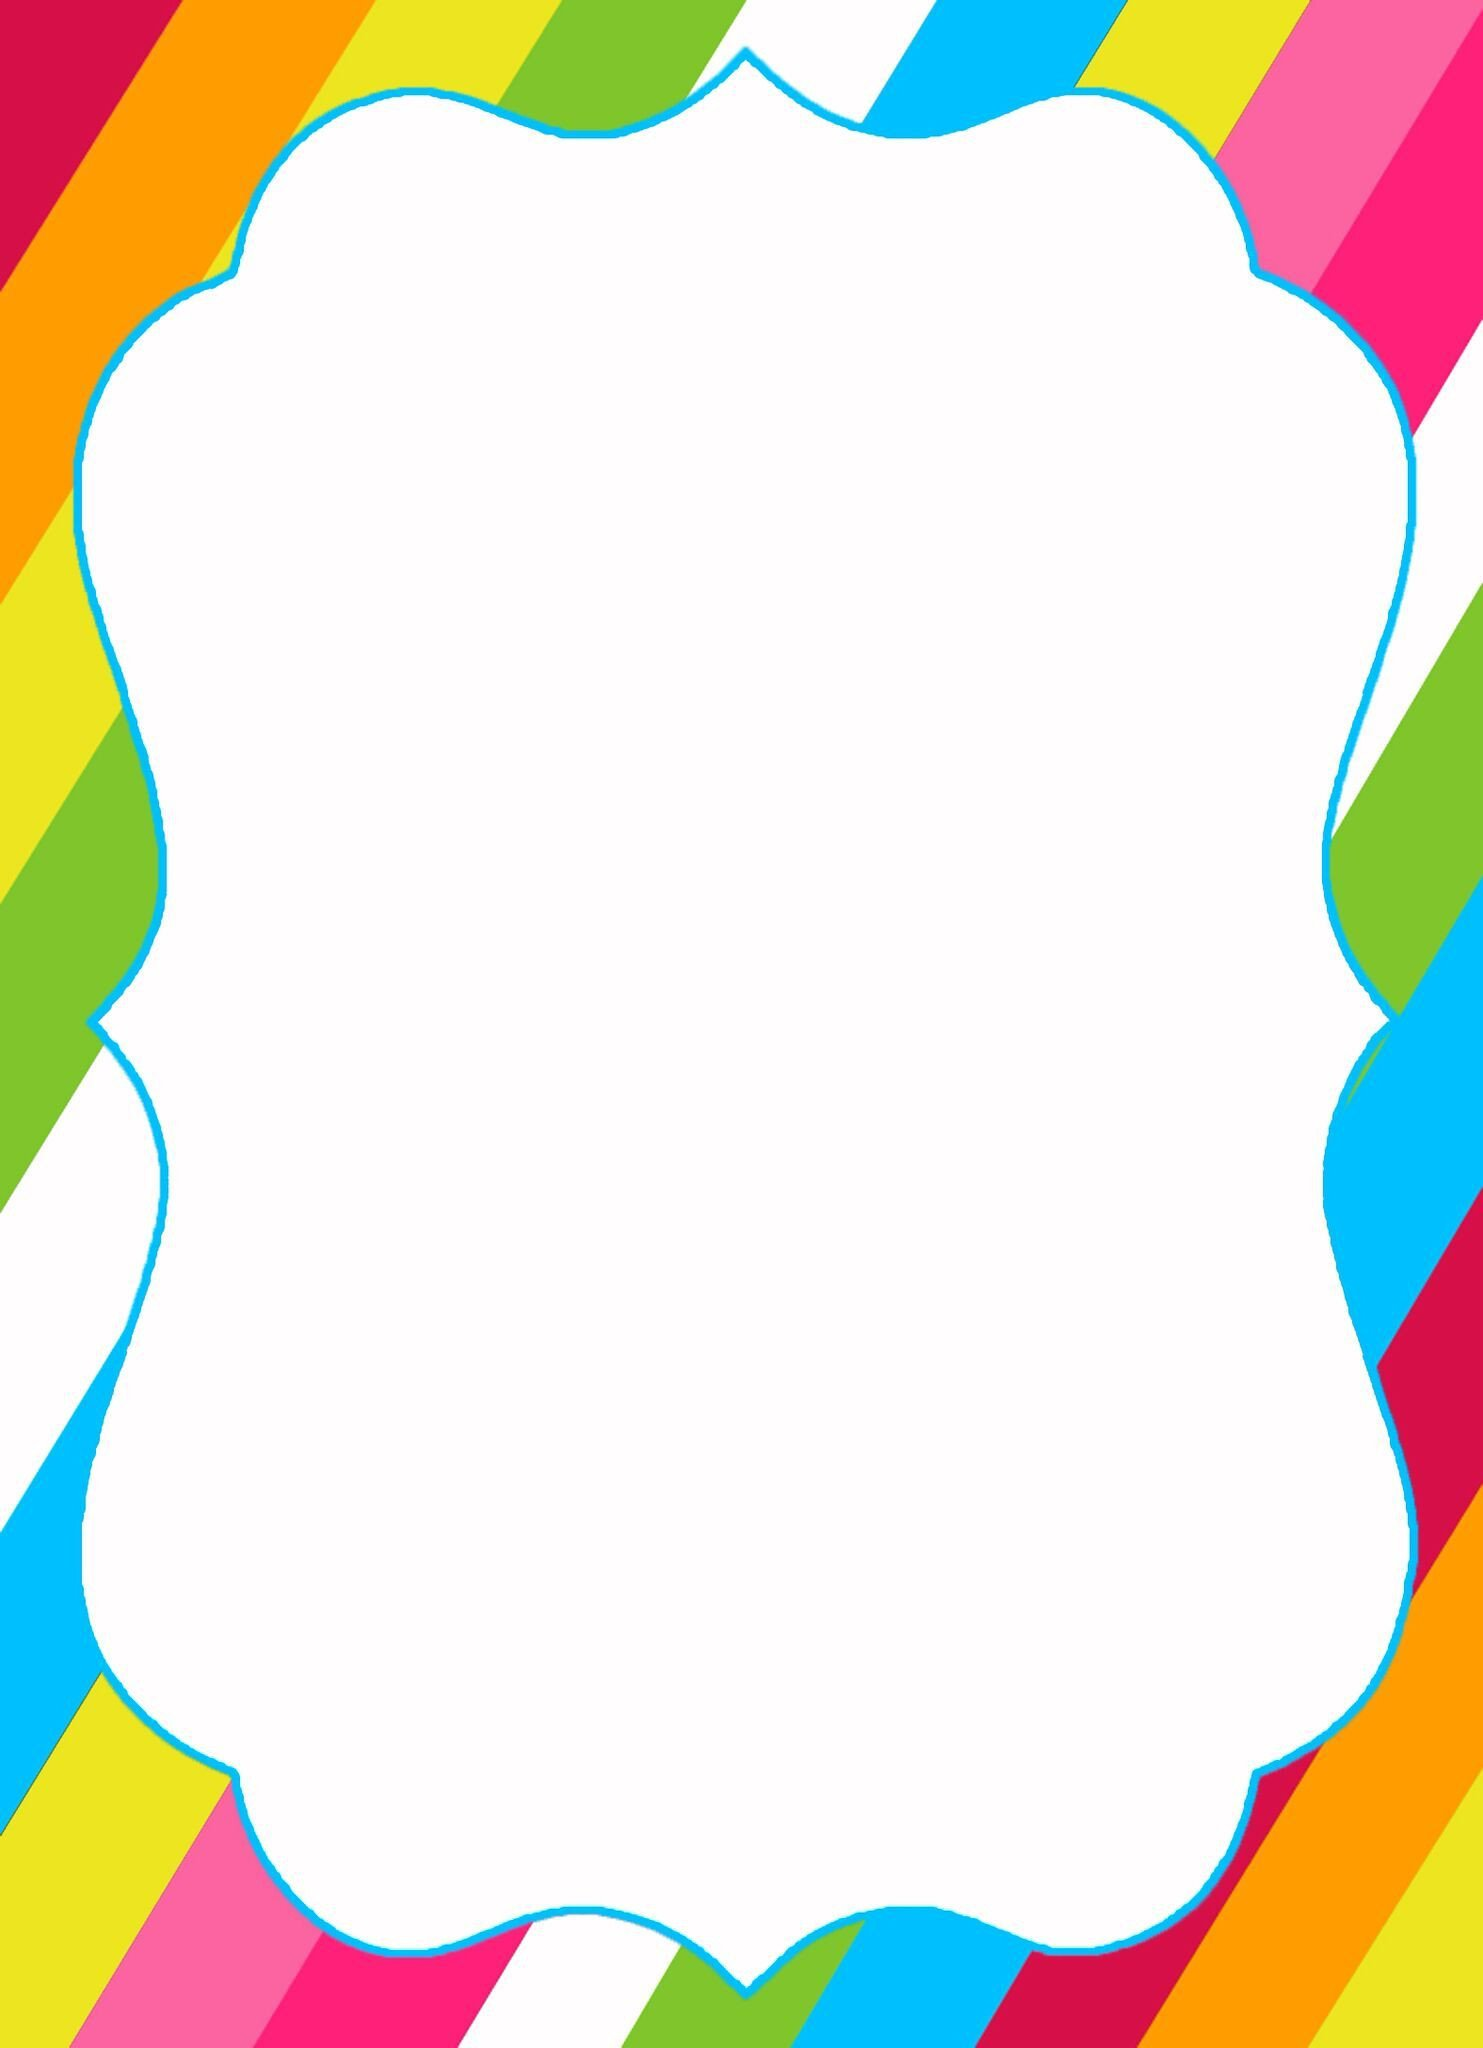 Free Blank Invitation Templates Dropbox Candyland Invitation